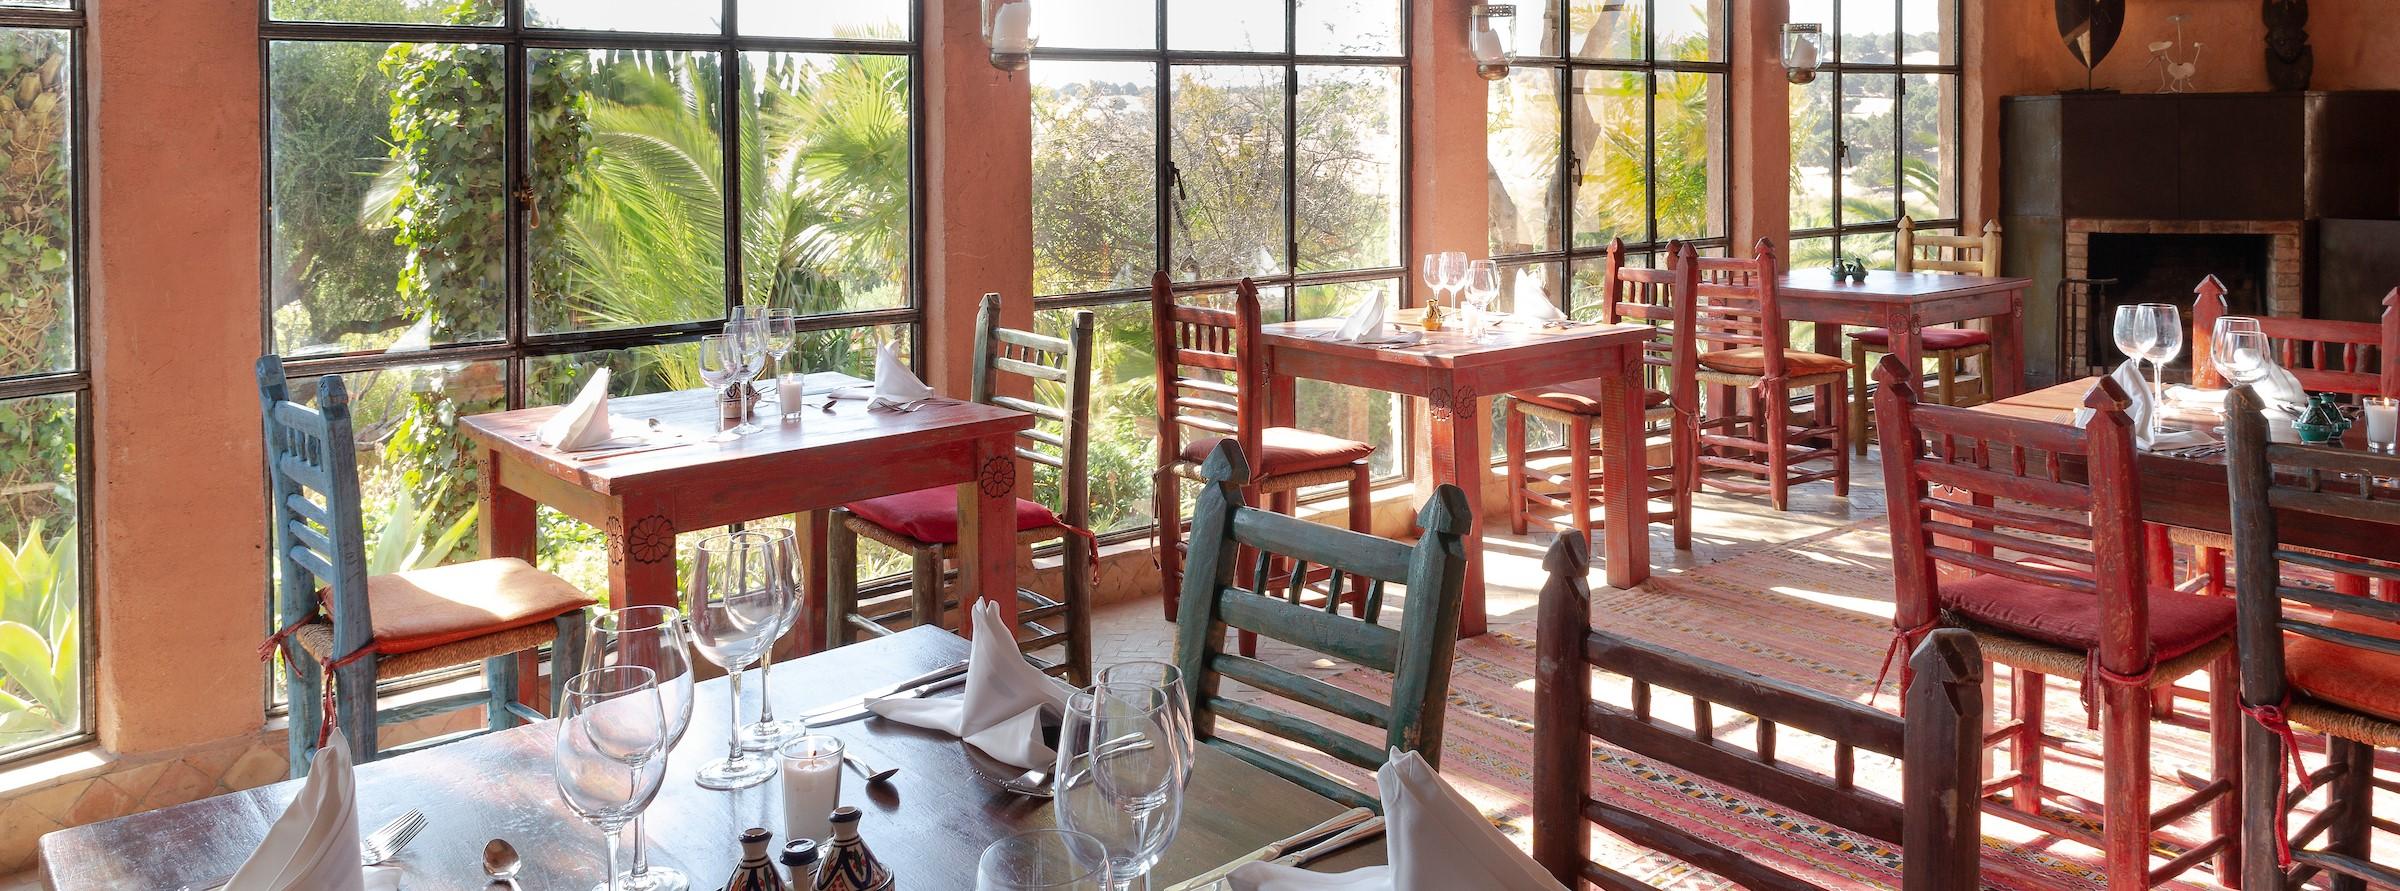 le-jardin-des-douars-dining-room